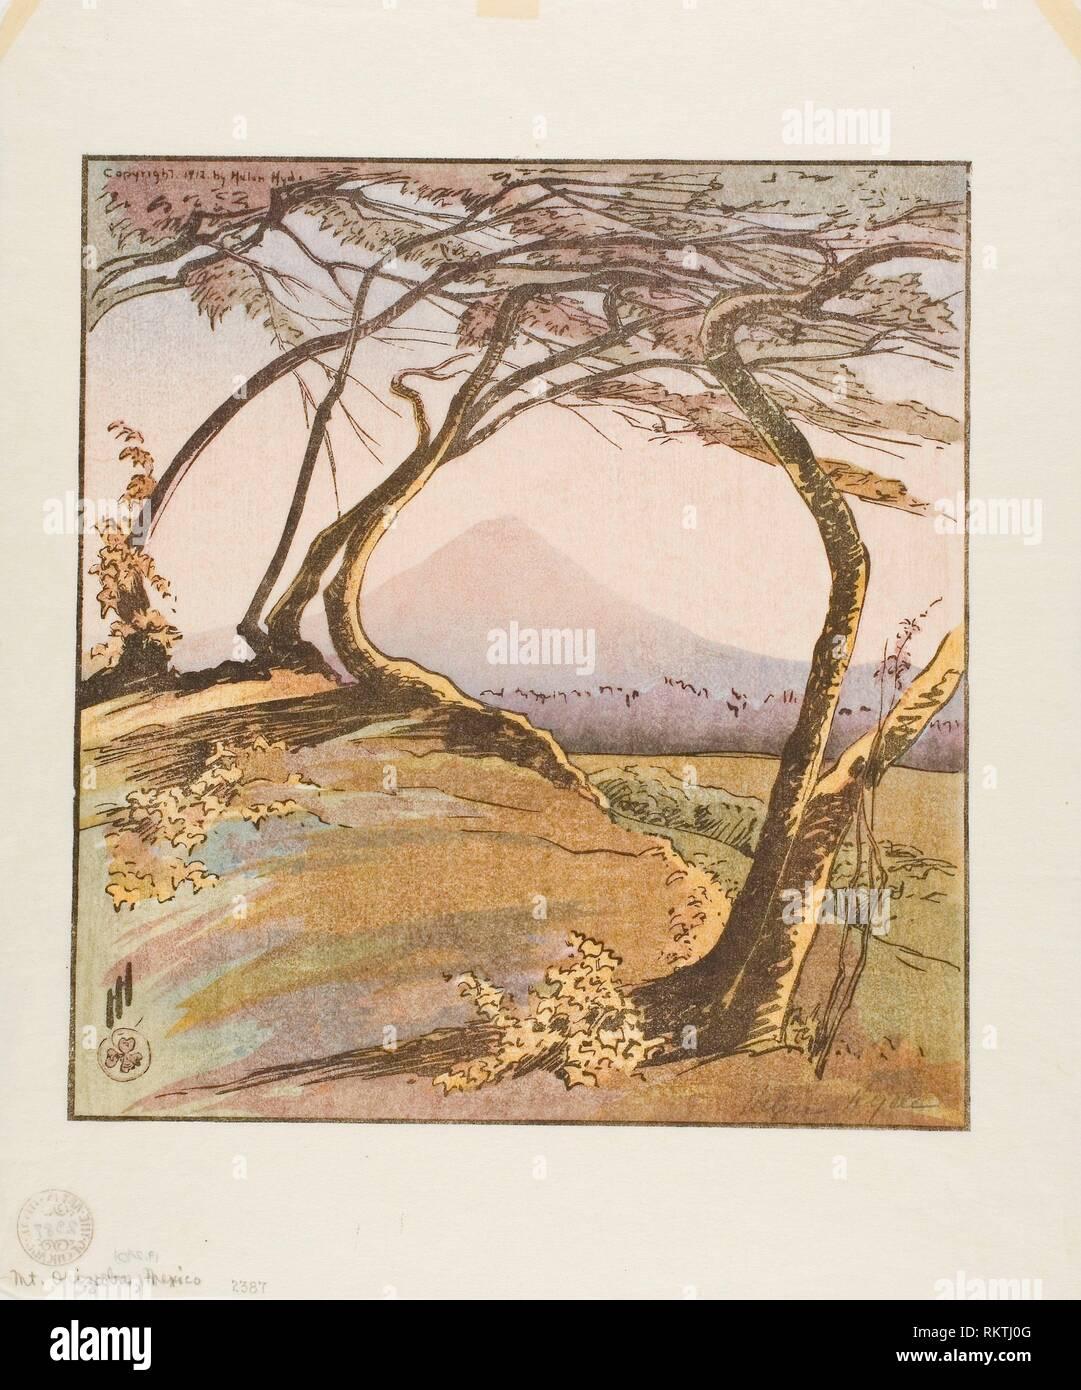 Mount Orizaba - 1912 - Helen Hyde American, 1868-1919 - Artist: Helen Hyde, Origin: United States, Date: 1912, Medium: Color woodcut on ivory - Stock Image